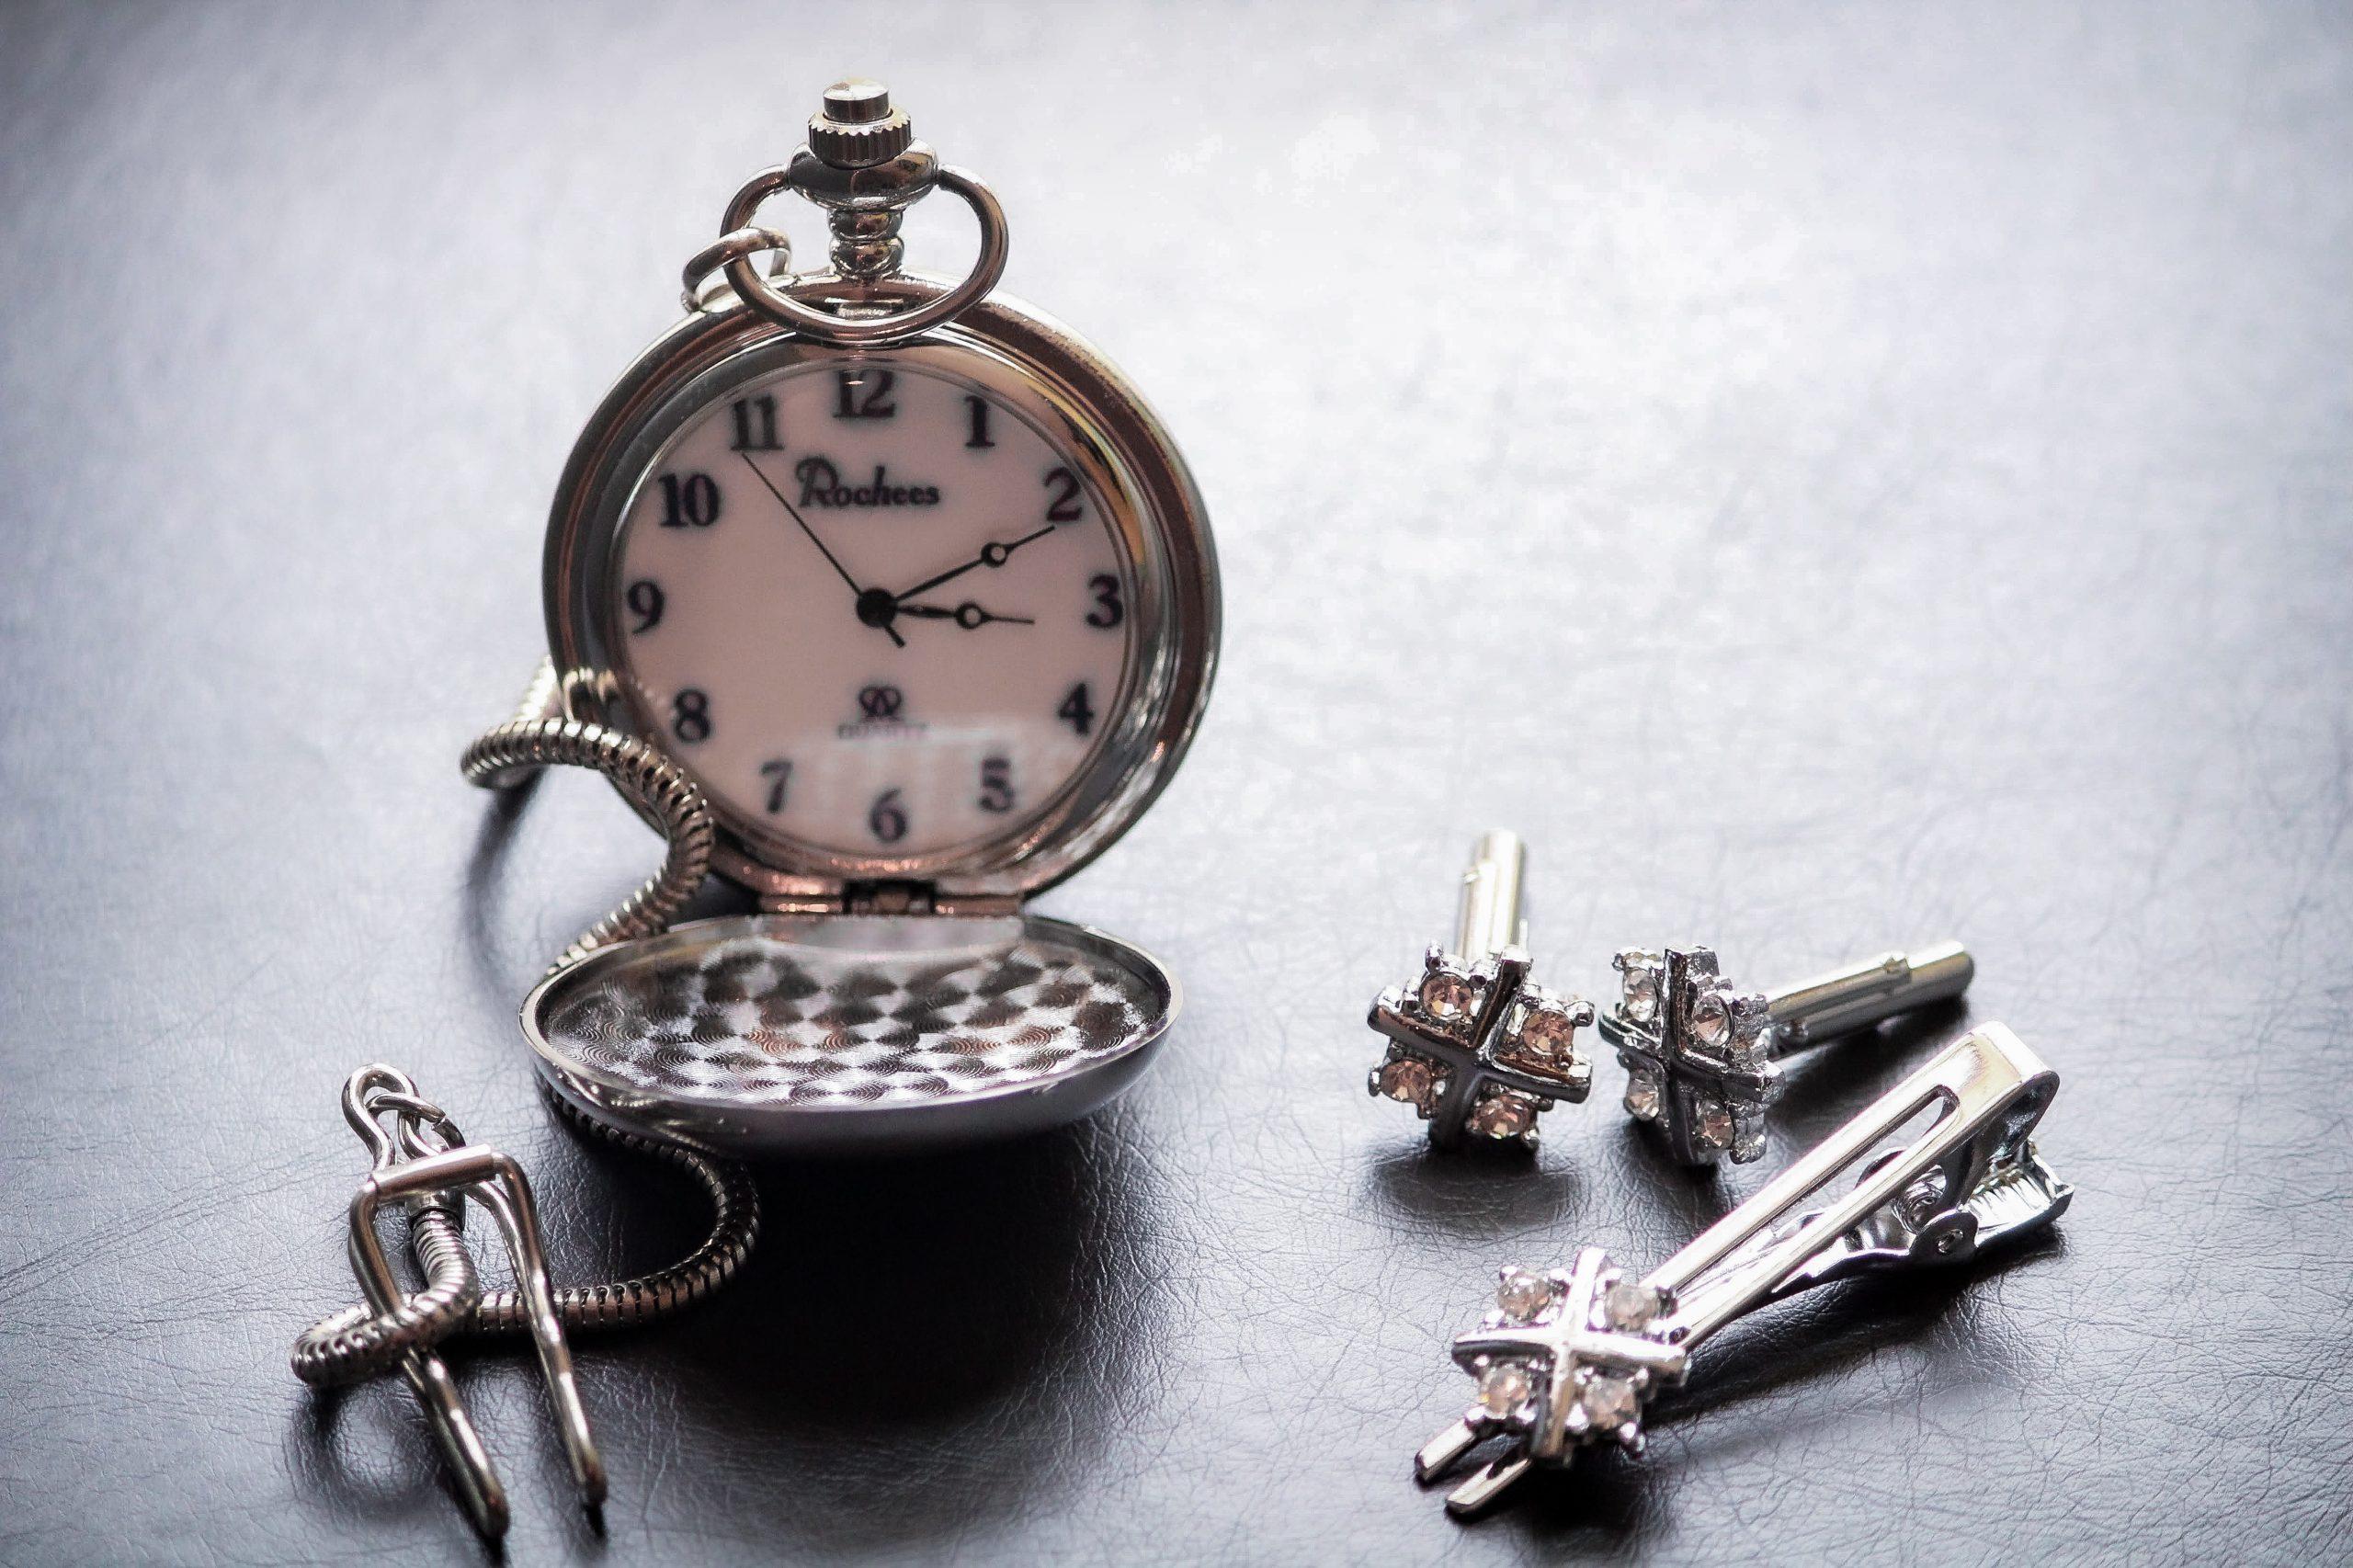 Old antique Watch with cufflinks